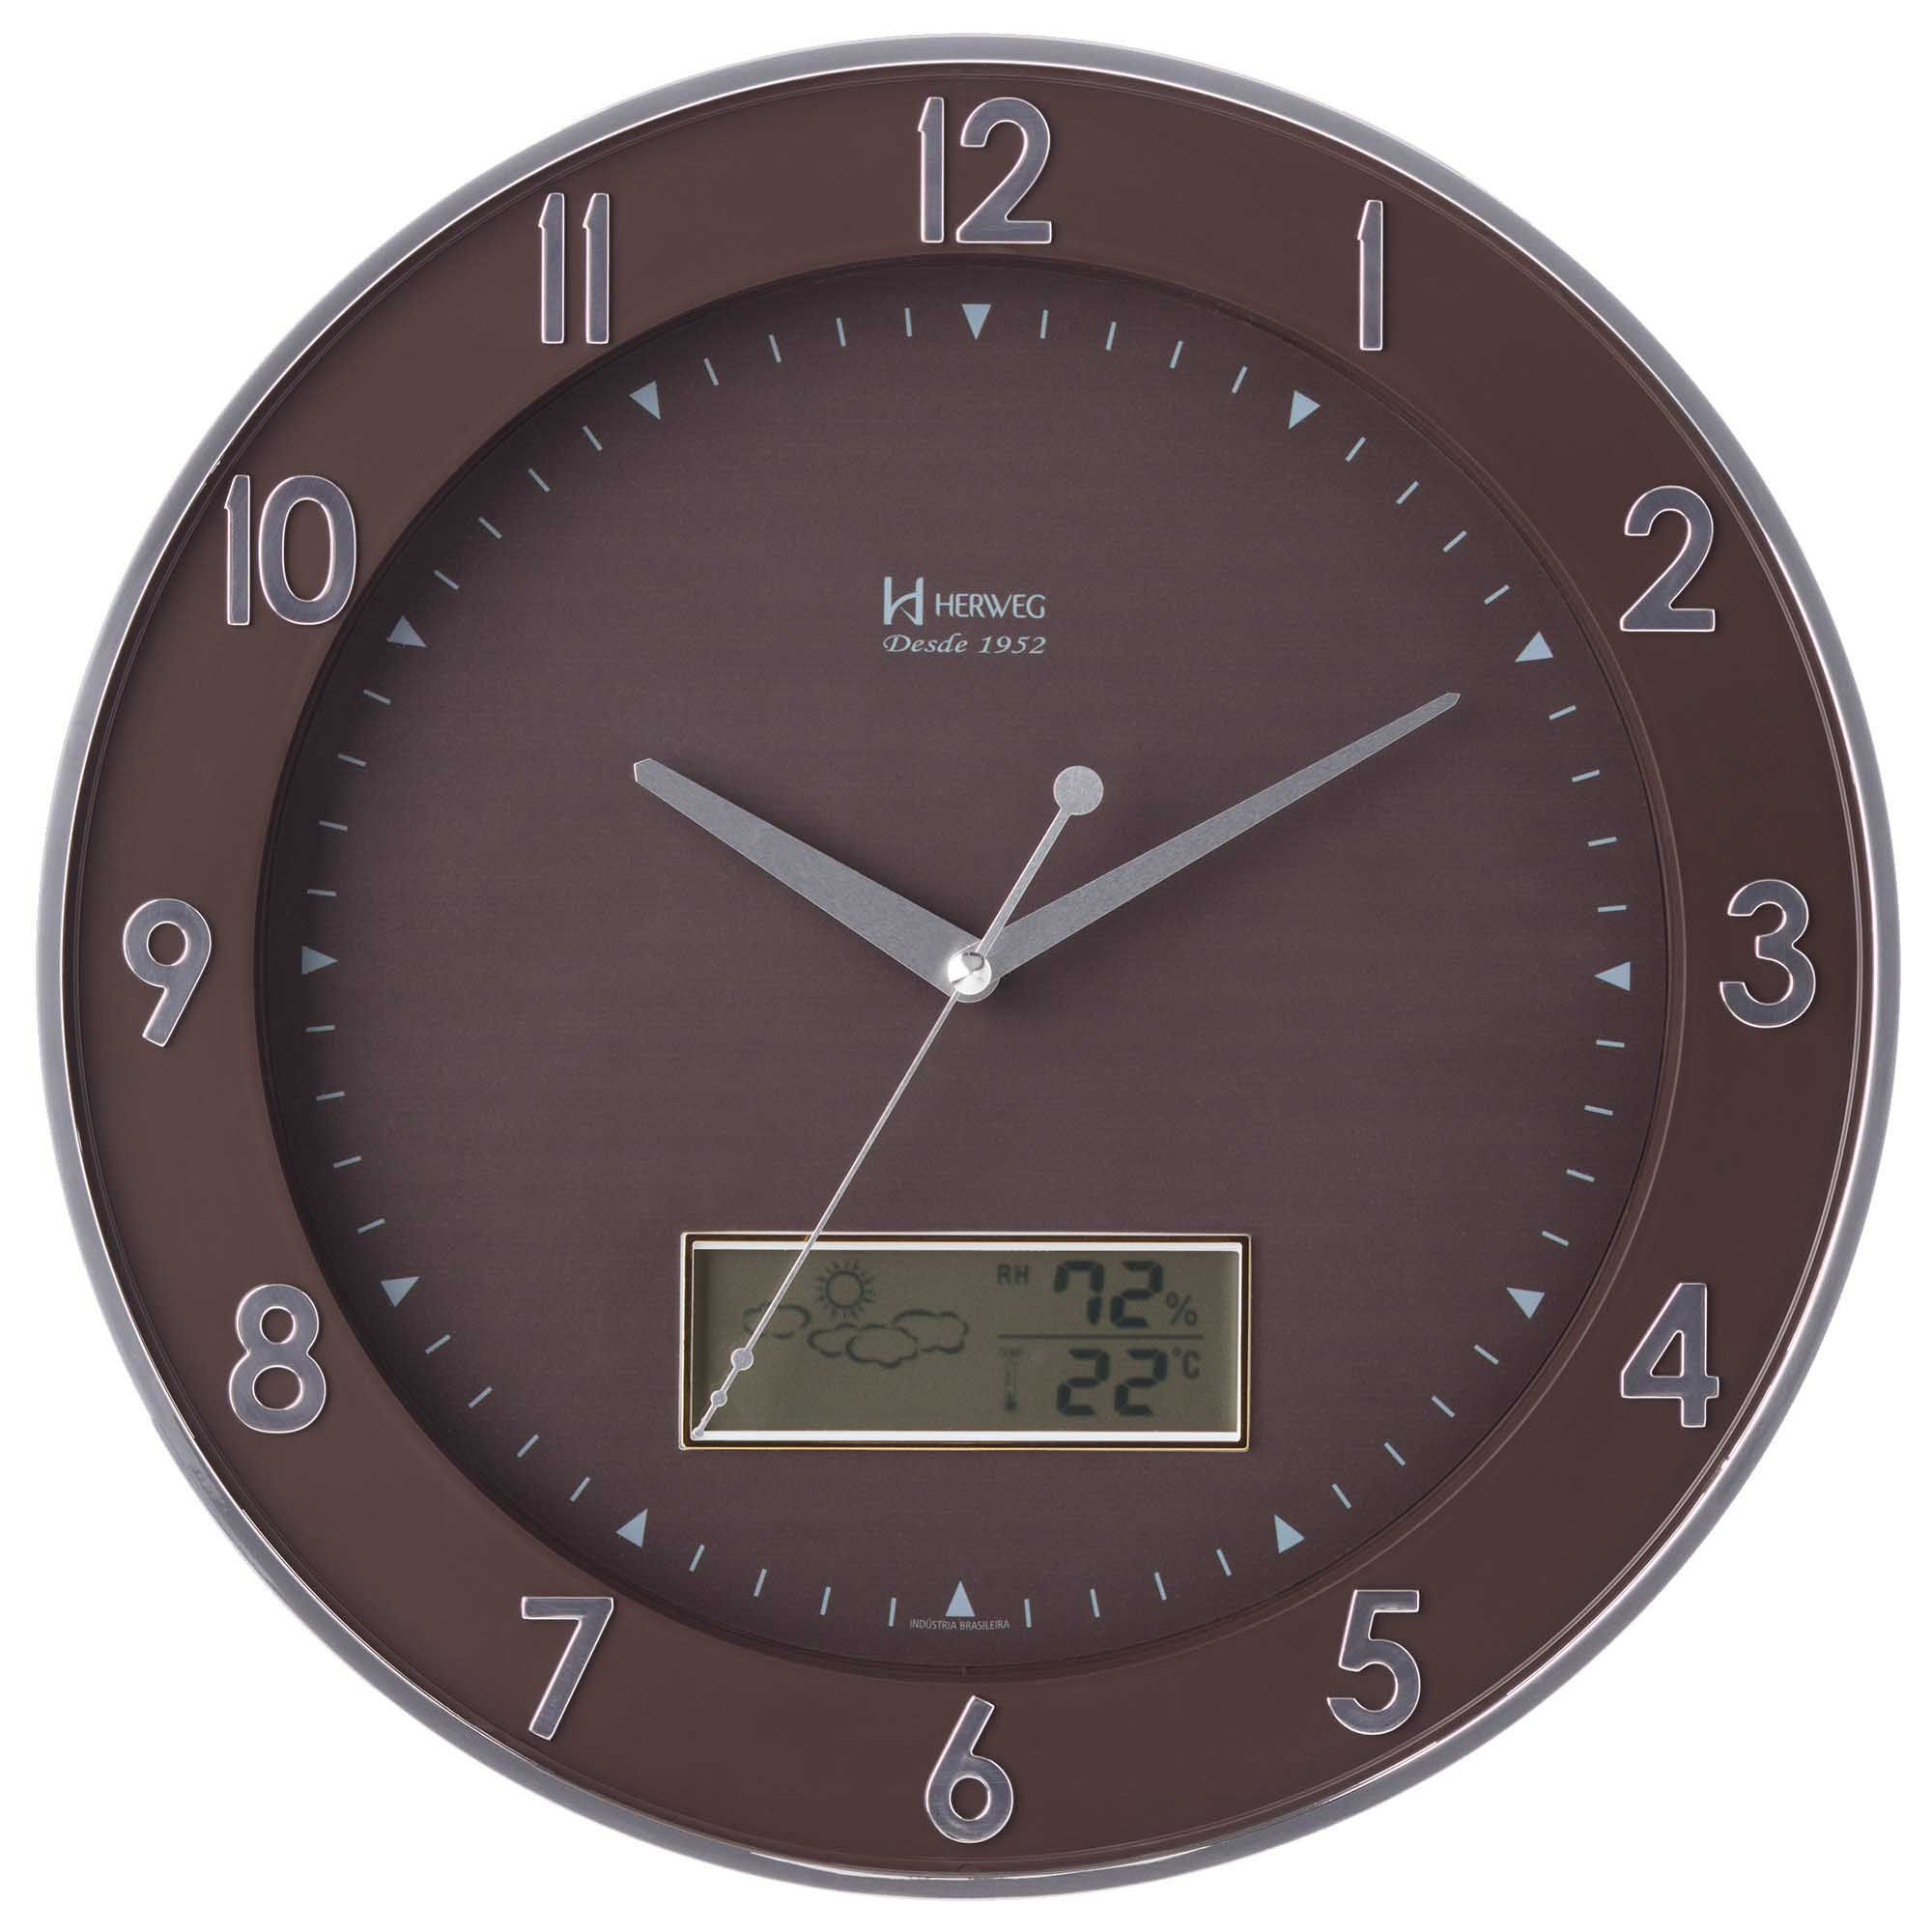 Relógio de Parede Anadigi Herweg 6808 028 Cromado